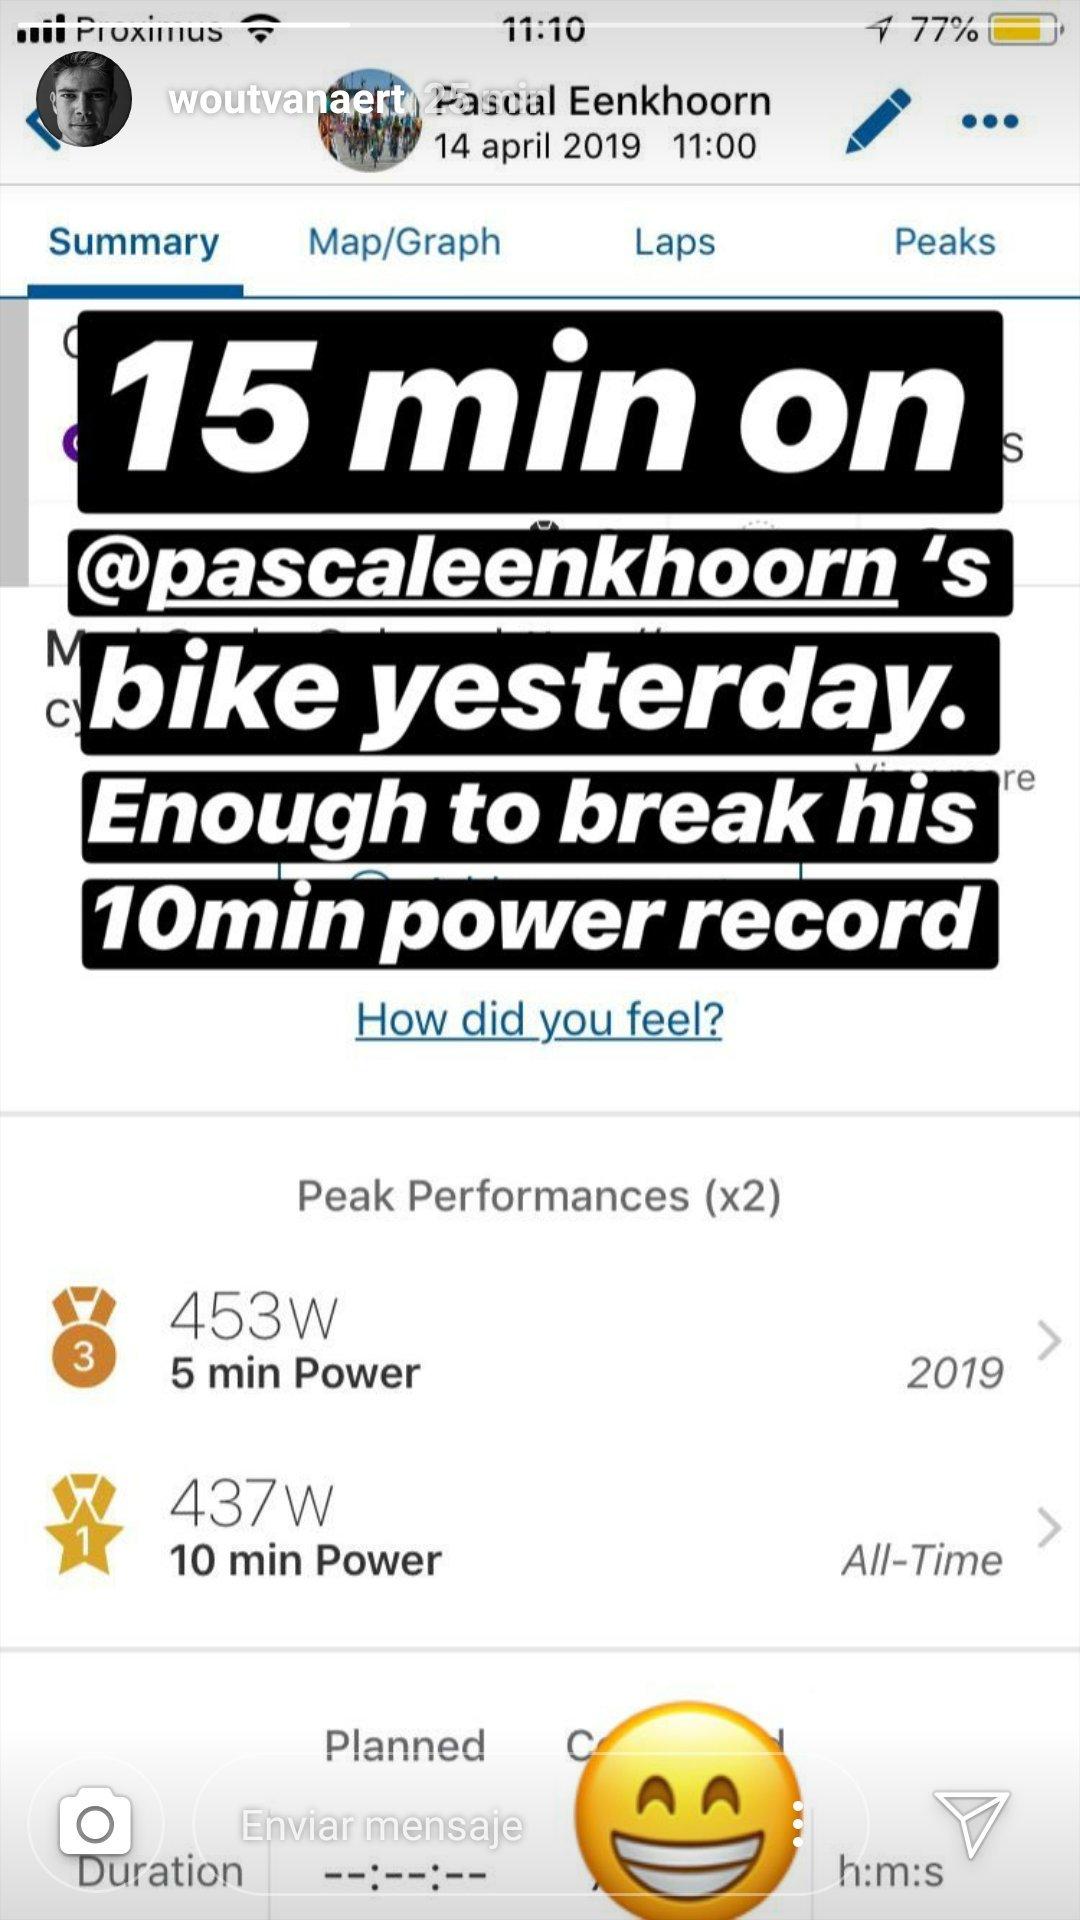 Ciclismo. - Página 12 D4MBx1KWsAAvZIz